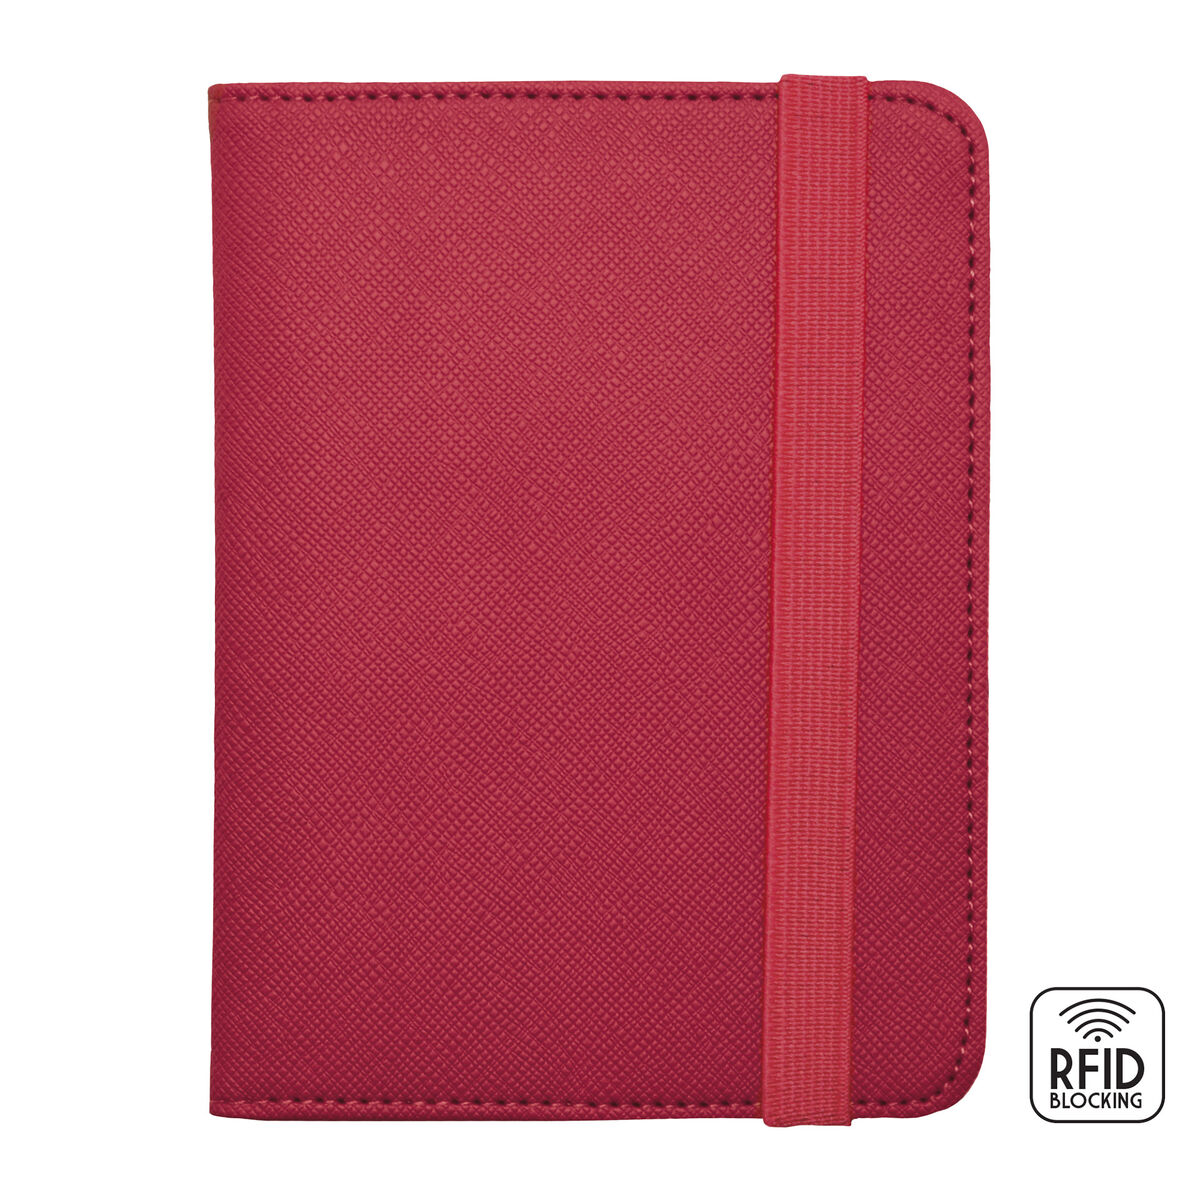 Passport Holder - Rfid Blocking, , zoom